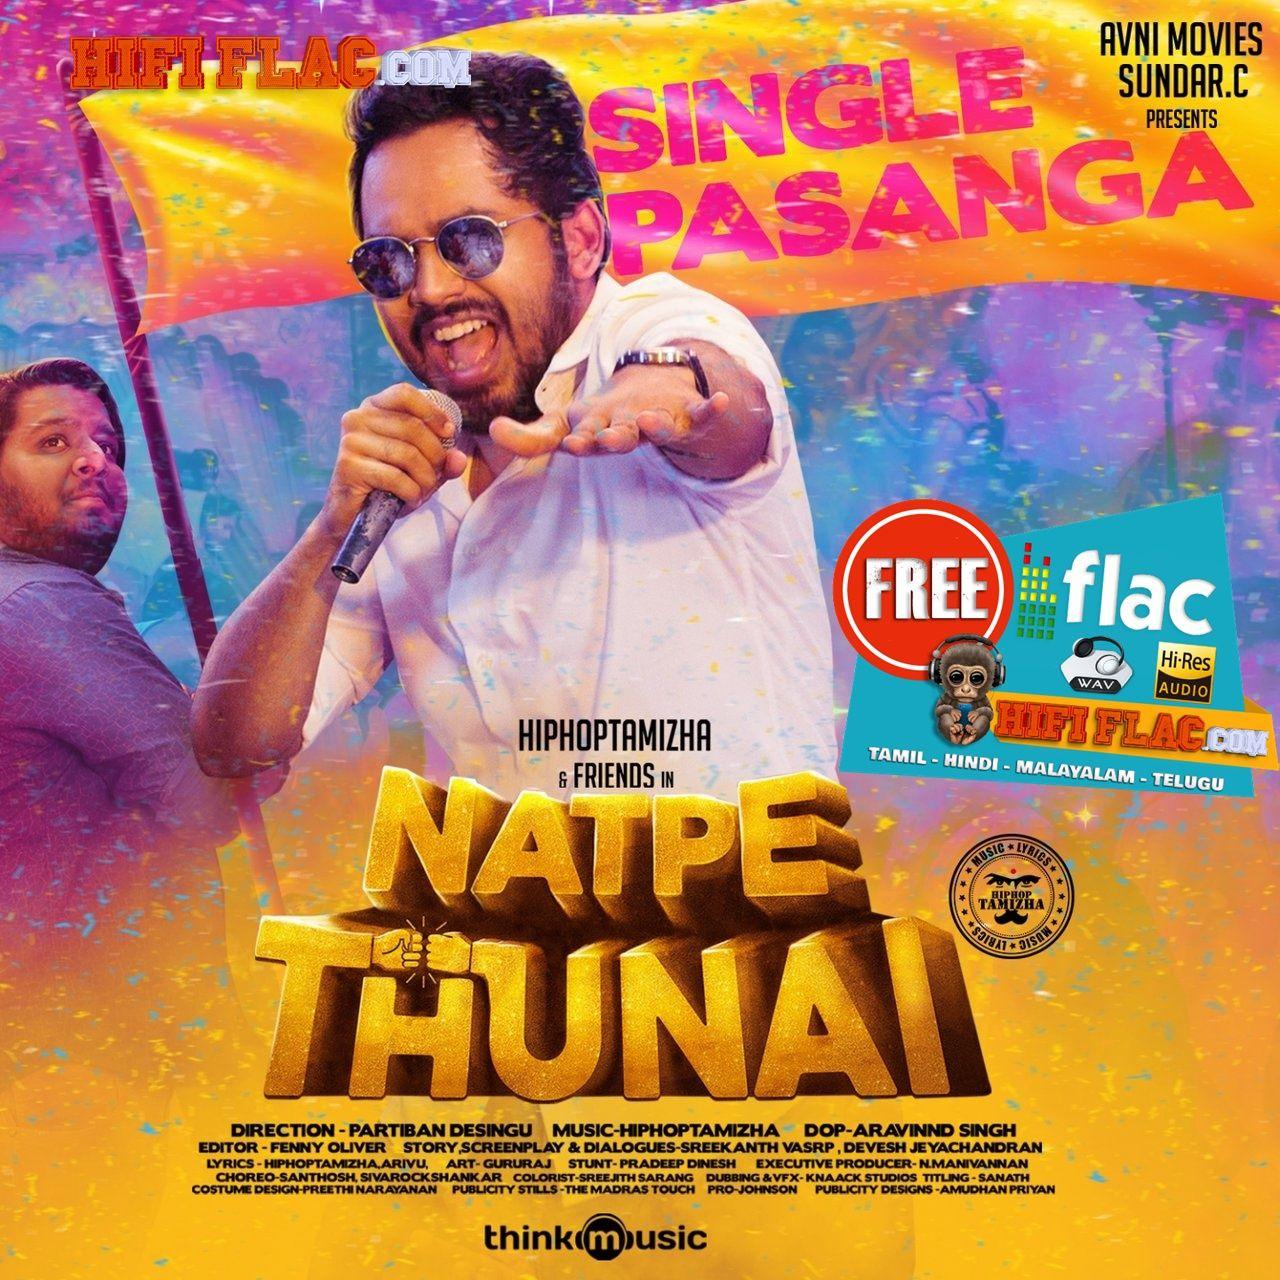 Single PasangaNatpe Thunai(2019)TamilSingleDIGITALRip